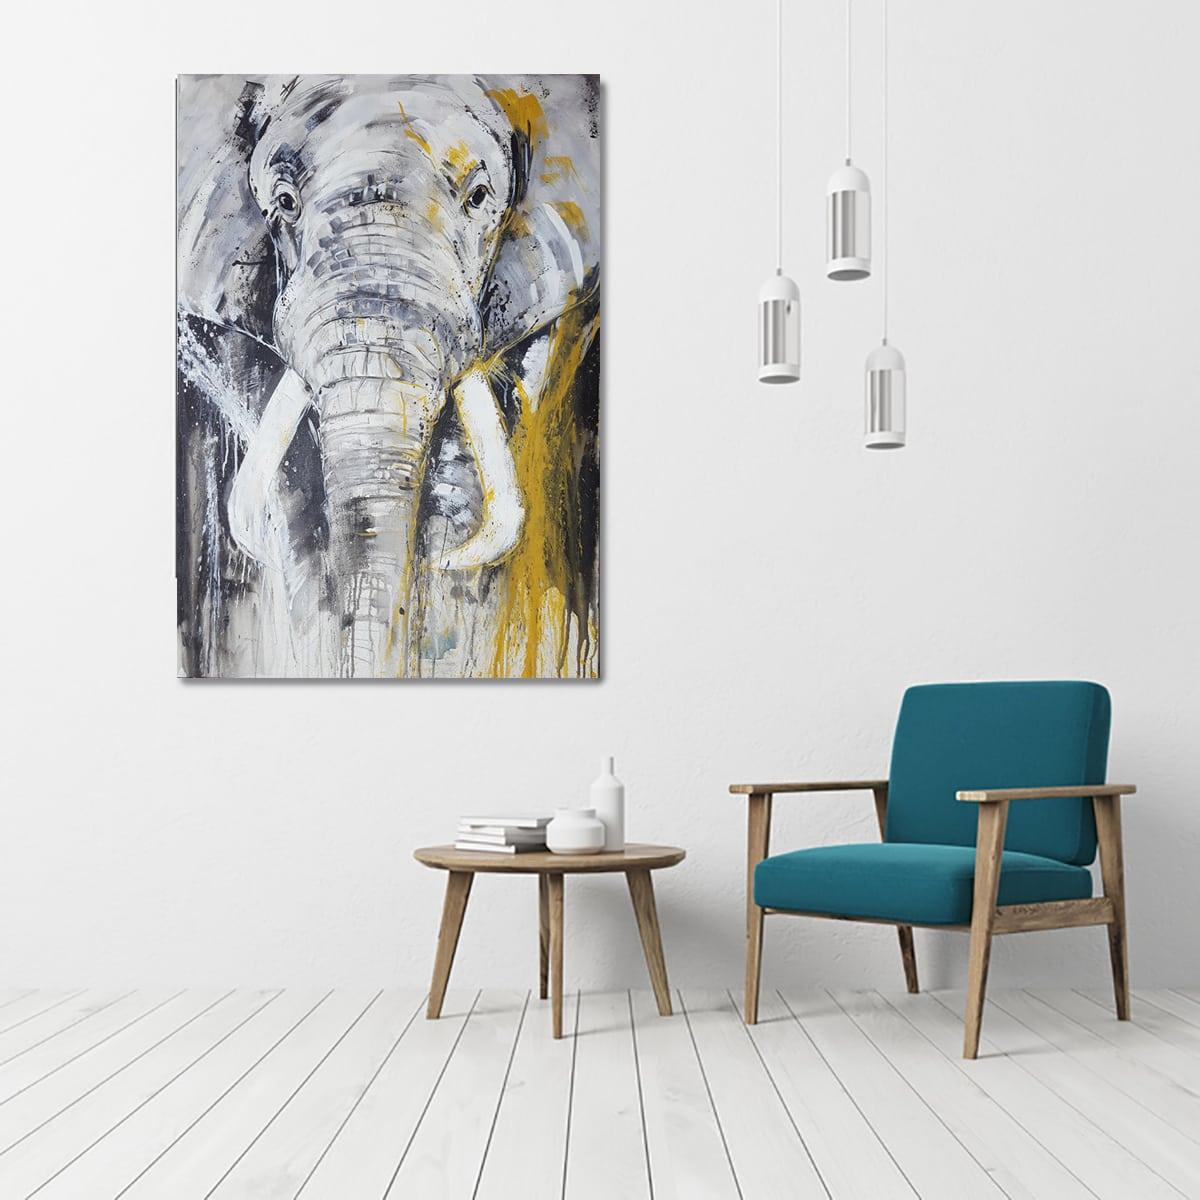 elefant leinwandbild im raum abstrakte bilder original gem lde malerei kunst online kaufen. Black Bedroom Furniture Sets. Home Design Ideas